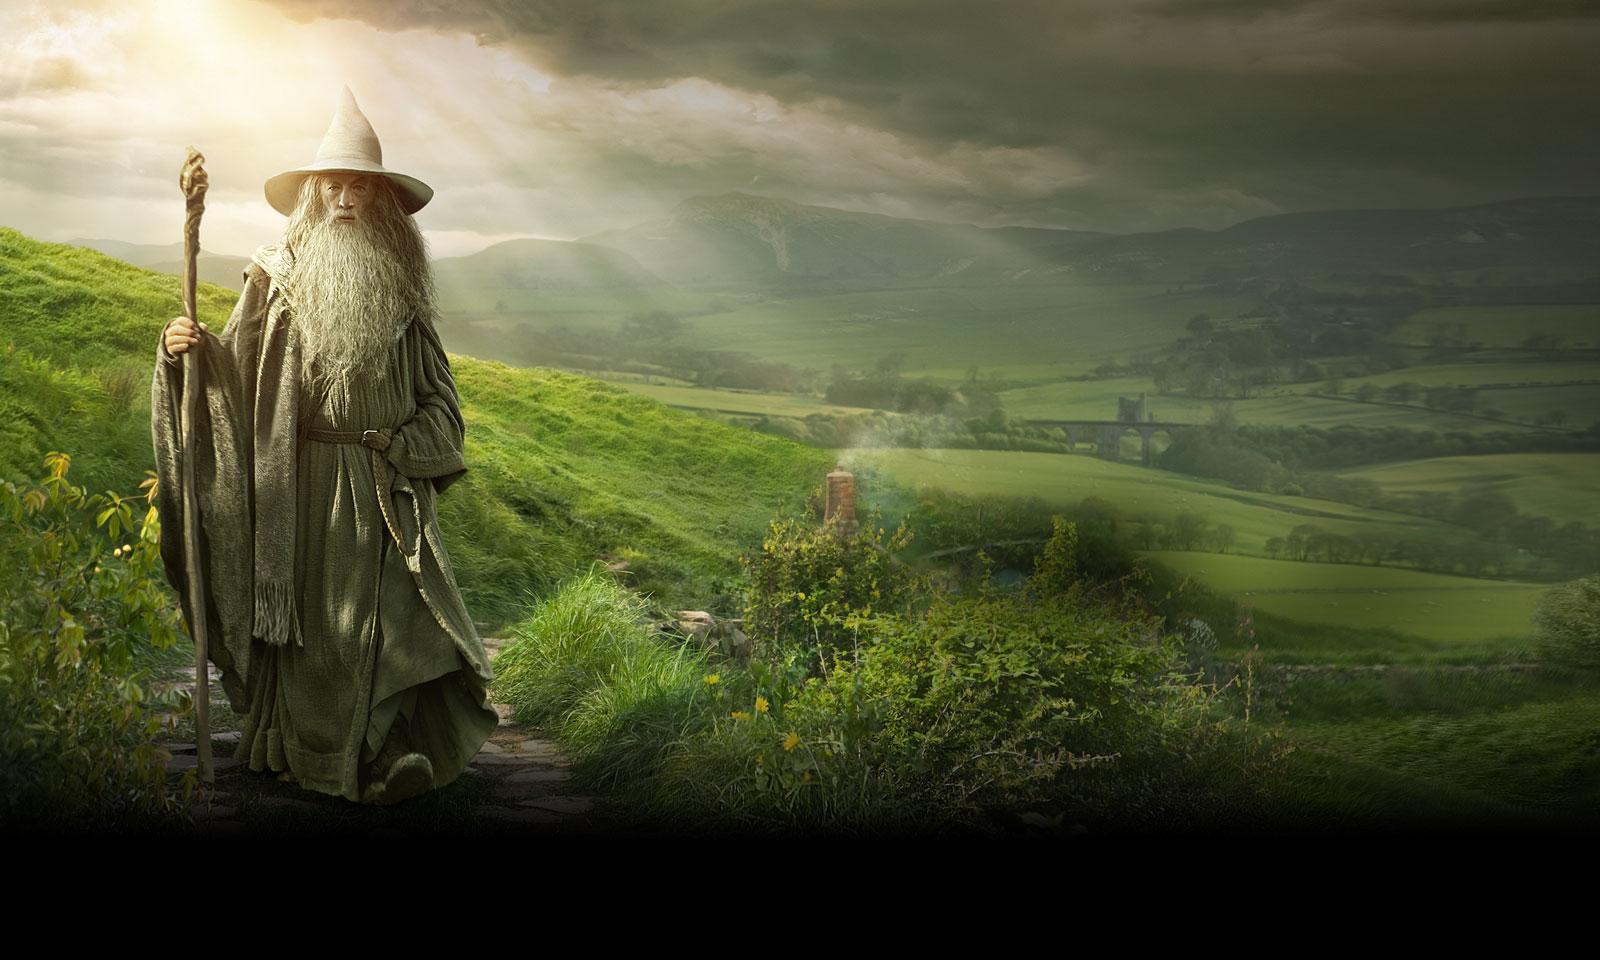 http://3.bp.blogspot.com/-qOjj2t3QuS4/UAoyavZrGzI/AAAAAAAABMc/hu-eYcWpoUs/s1600/The+Hobbit+Gandalf+Wallpaper.jpg